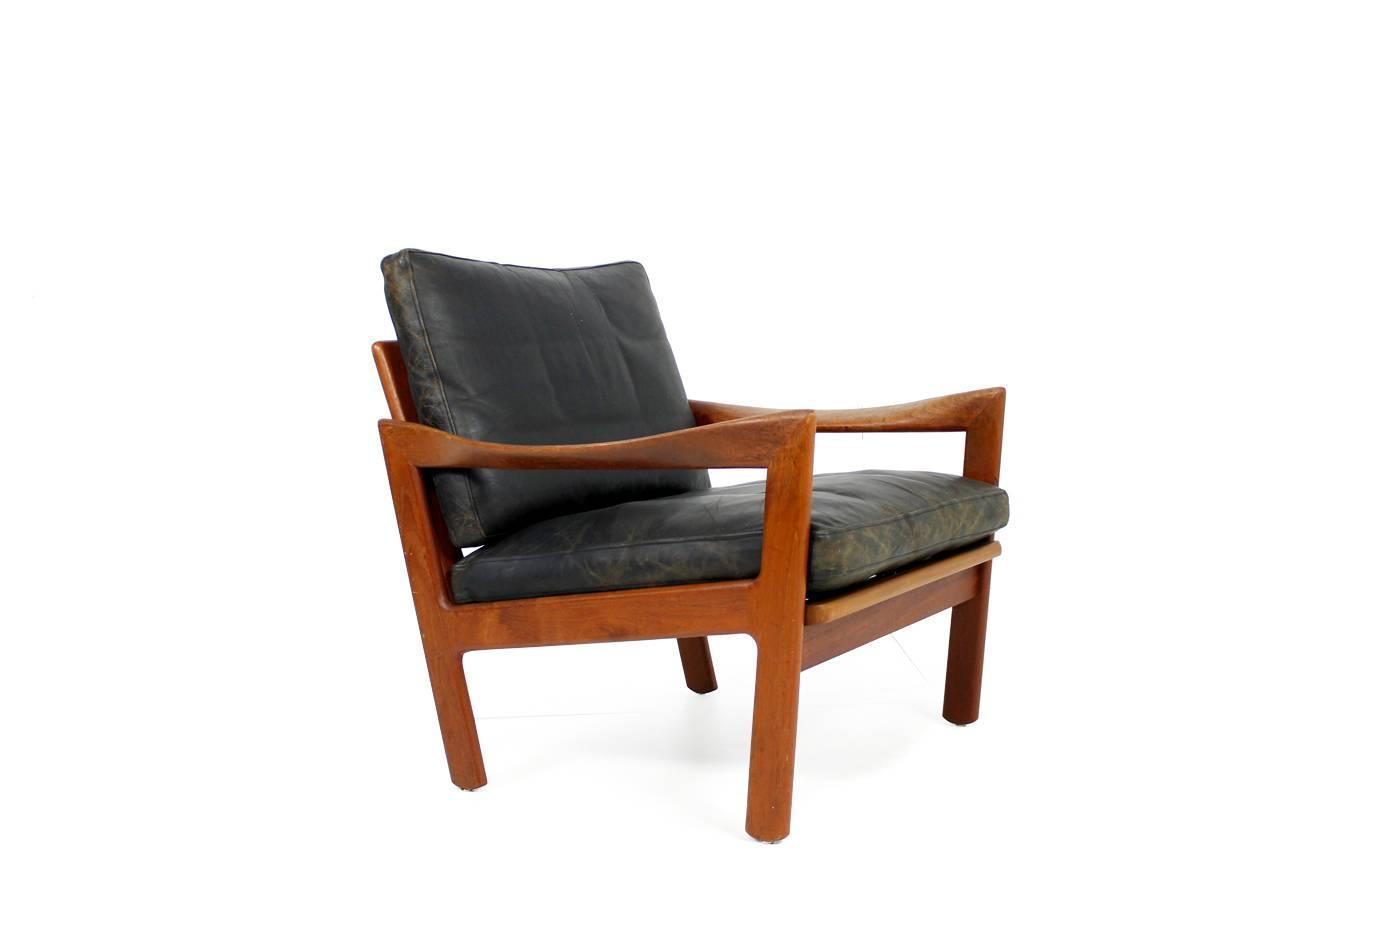 Mid Century Modern Illum Wikkelso Teak and Leather Easy